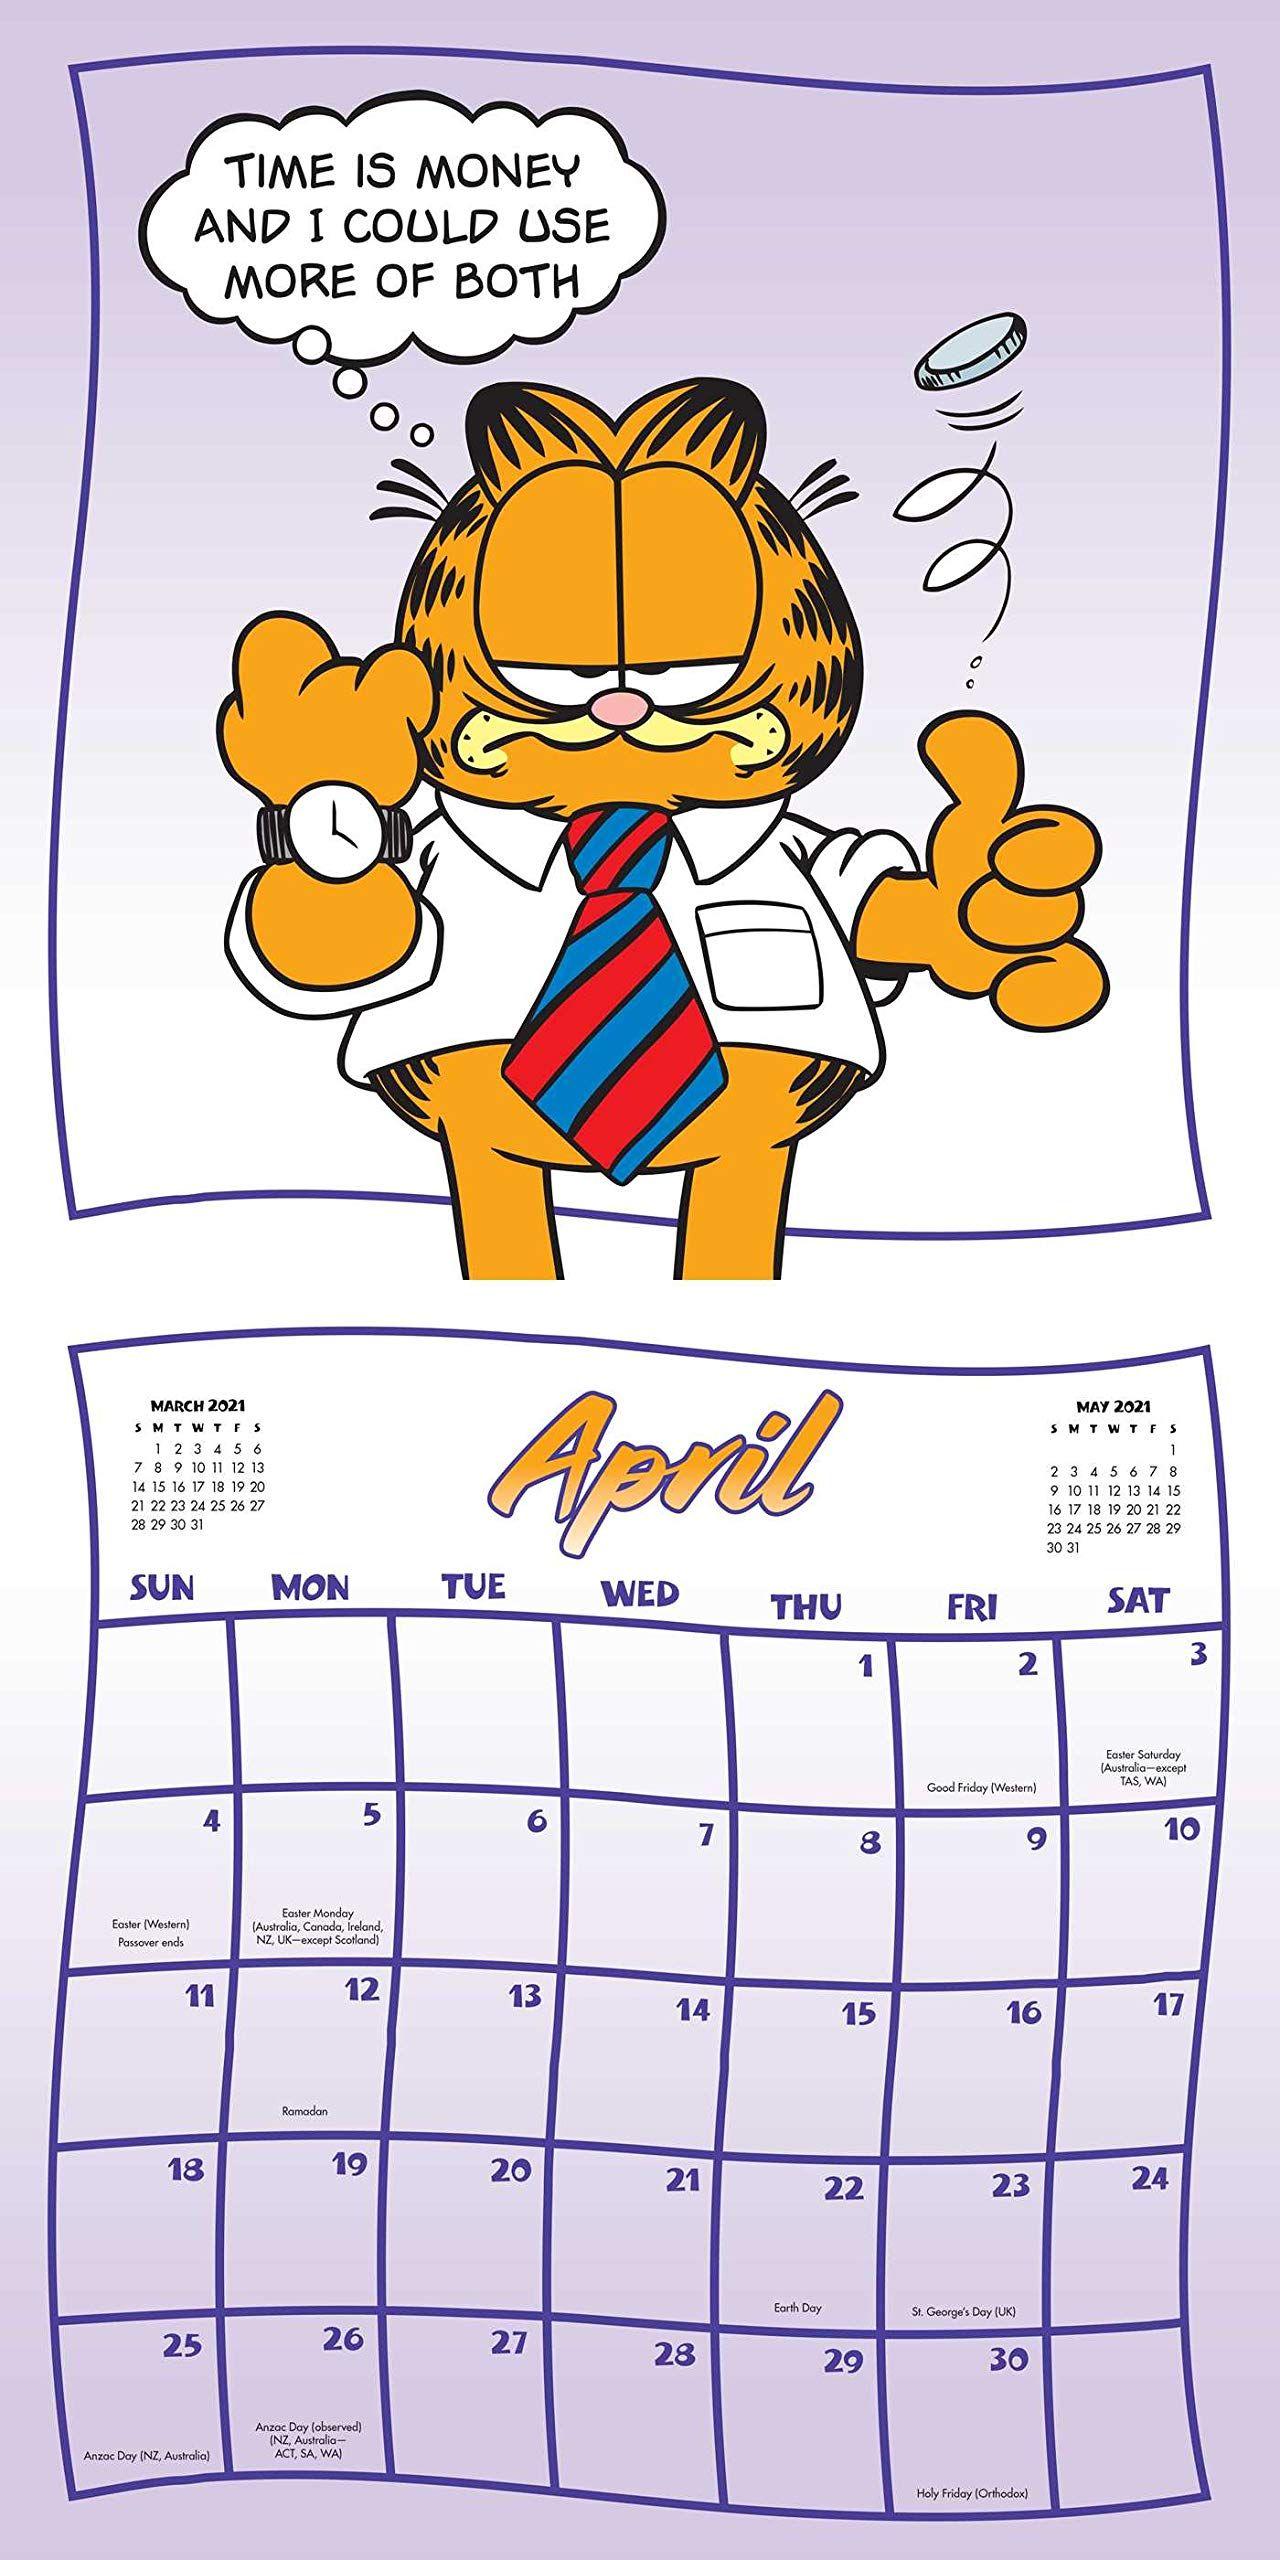 Garfield April 2021 Calendar Page In 2020 Garfield Cartoon Icons Cartoonist